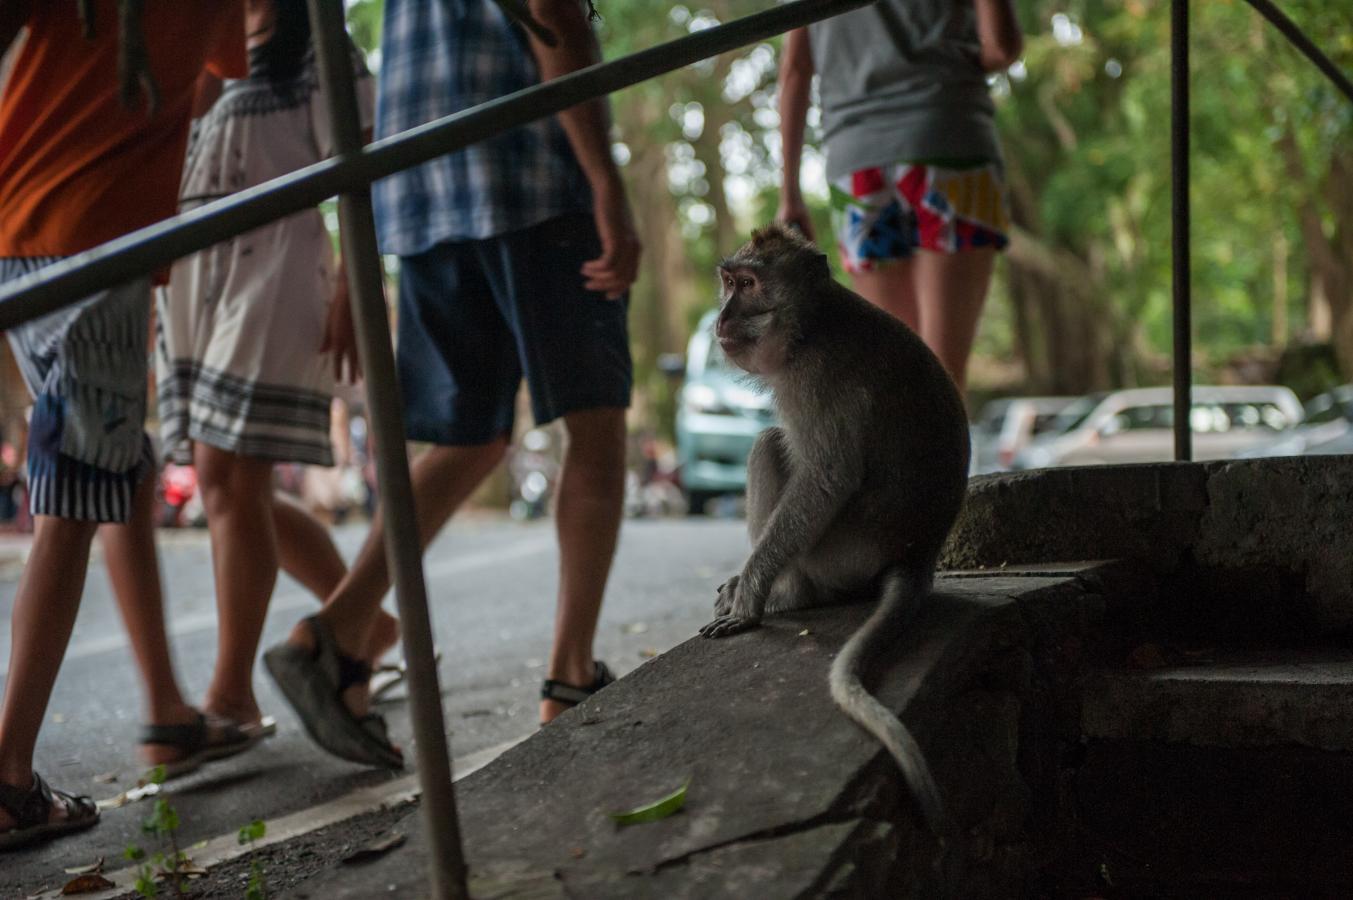 monkey-looking-at-the-people-ubud-bali-2013